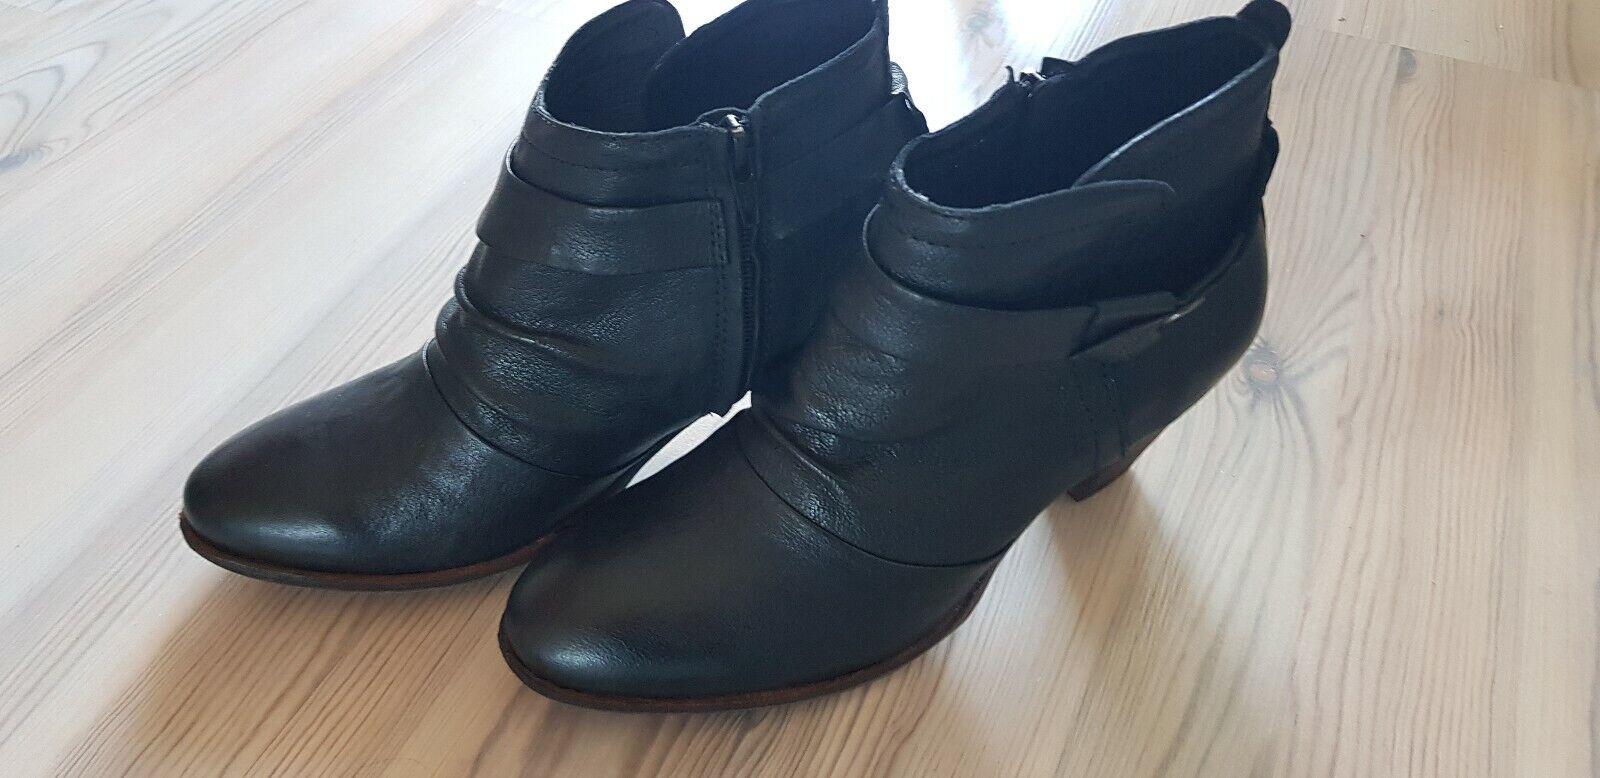 FrotsBRUDER Ankle Stiefel, schwarz, Gr. 38 - neu